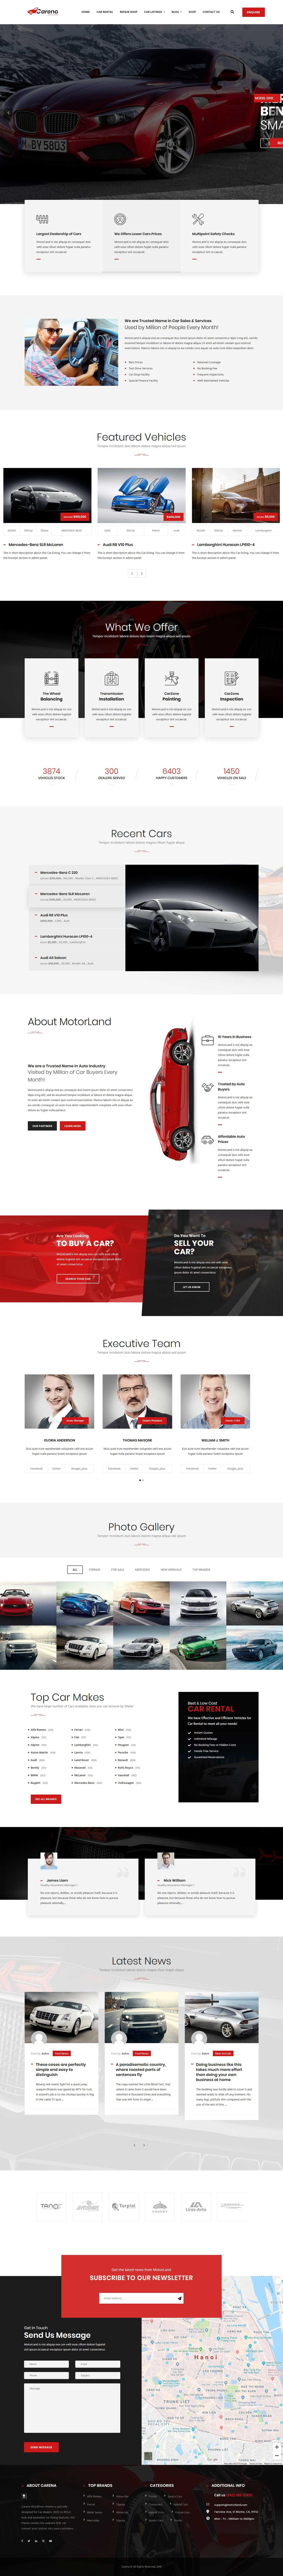 Carena - Best Premium Automobile WordPress Theme